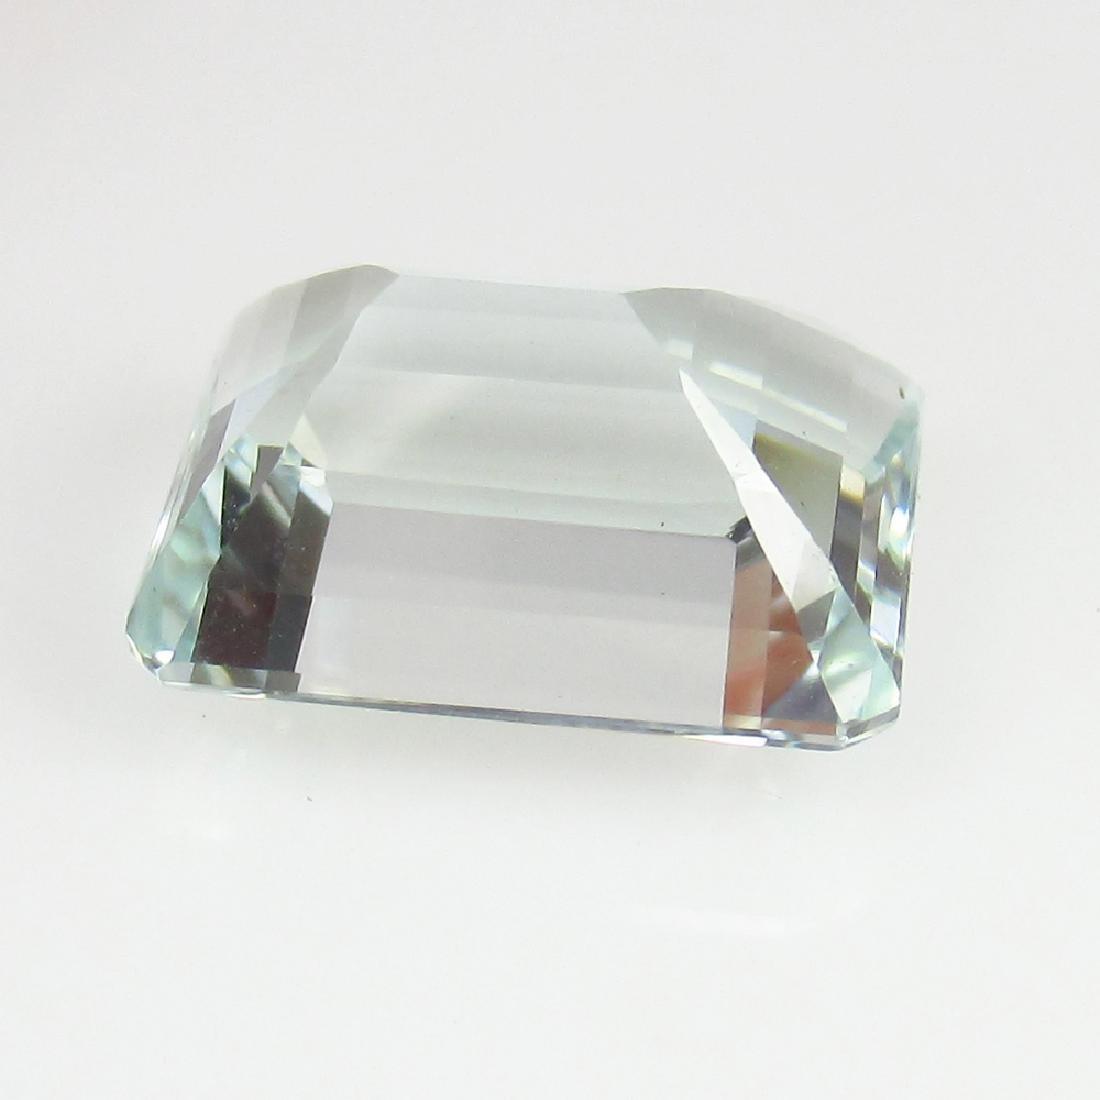 5.32 Ctw Natural Loose Excellent Emerald cut Aquamarine - 2